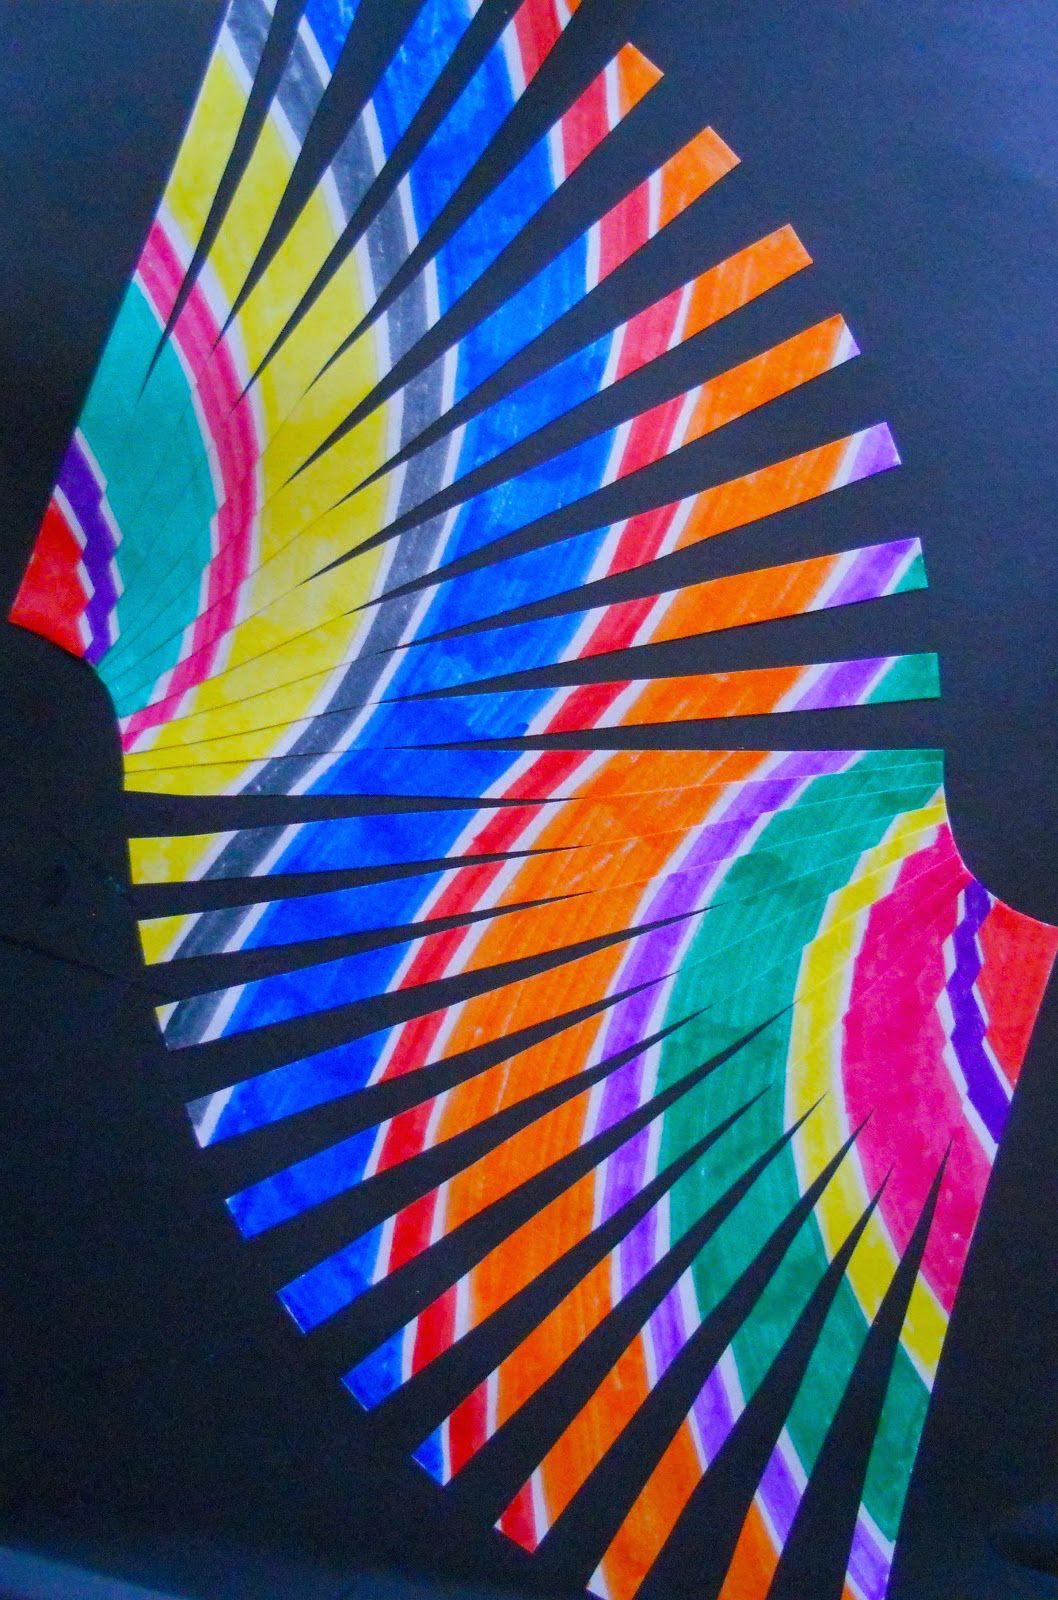 Design To Quilt Principles Of Design Rhythm Movement Week 39 Basic Design Principles Principles Of Design Principles Of Art